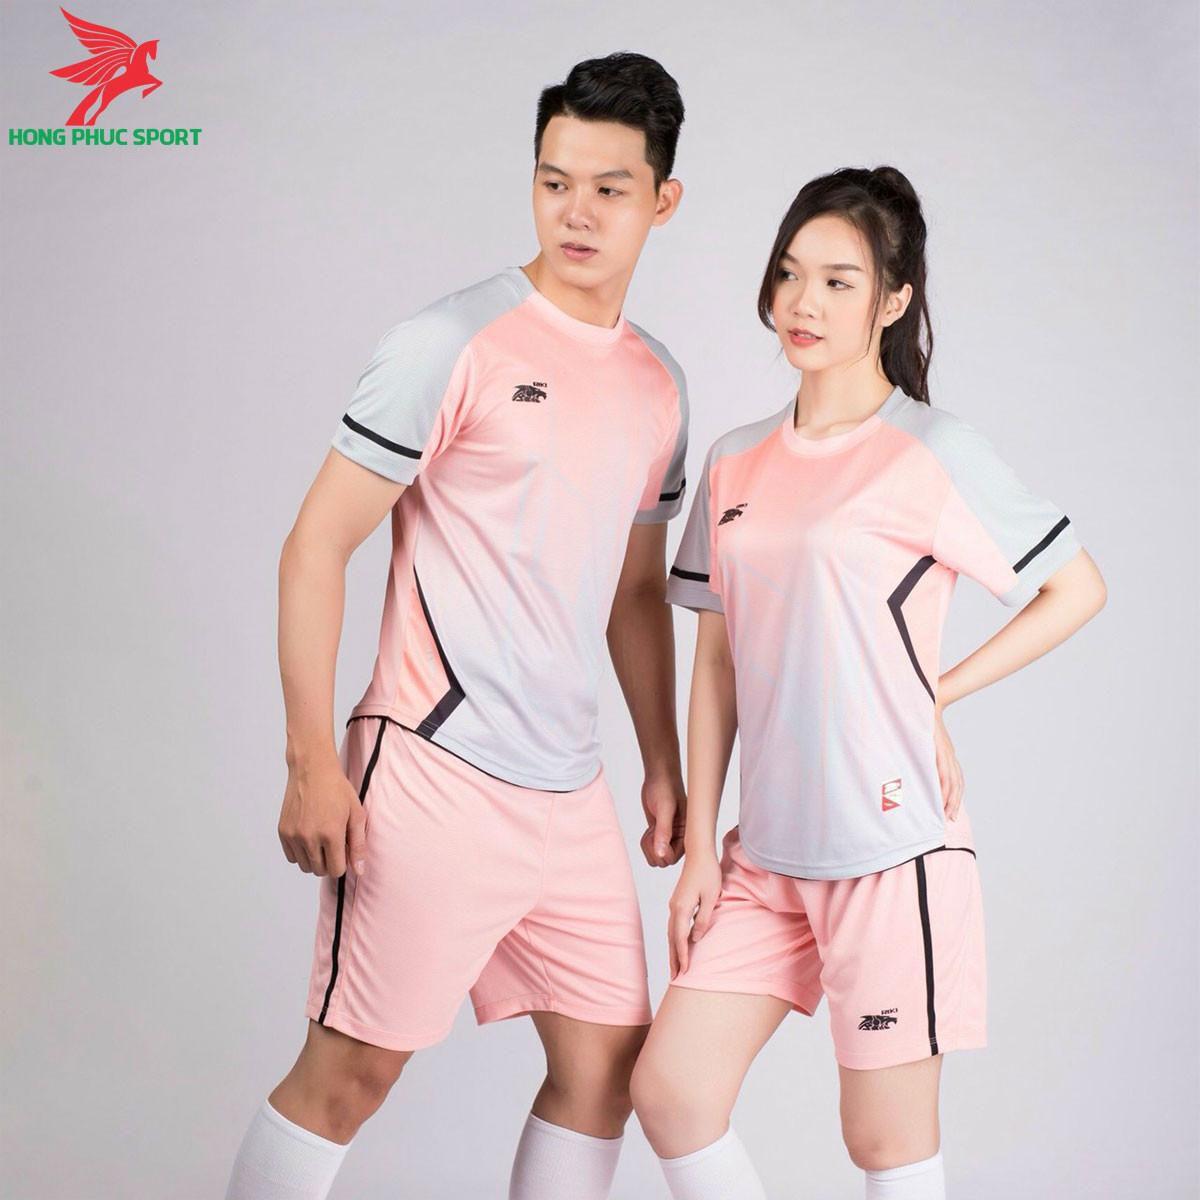 https://cdn.hongphucsport.com/unsafe/s4.shopbay.vn/files/285/ao-khong-logo-riki-airmaxx-mau-hong-2-603eedc236472.jpg